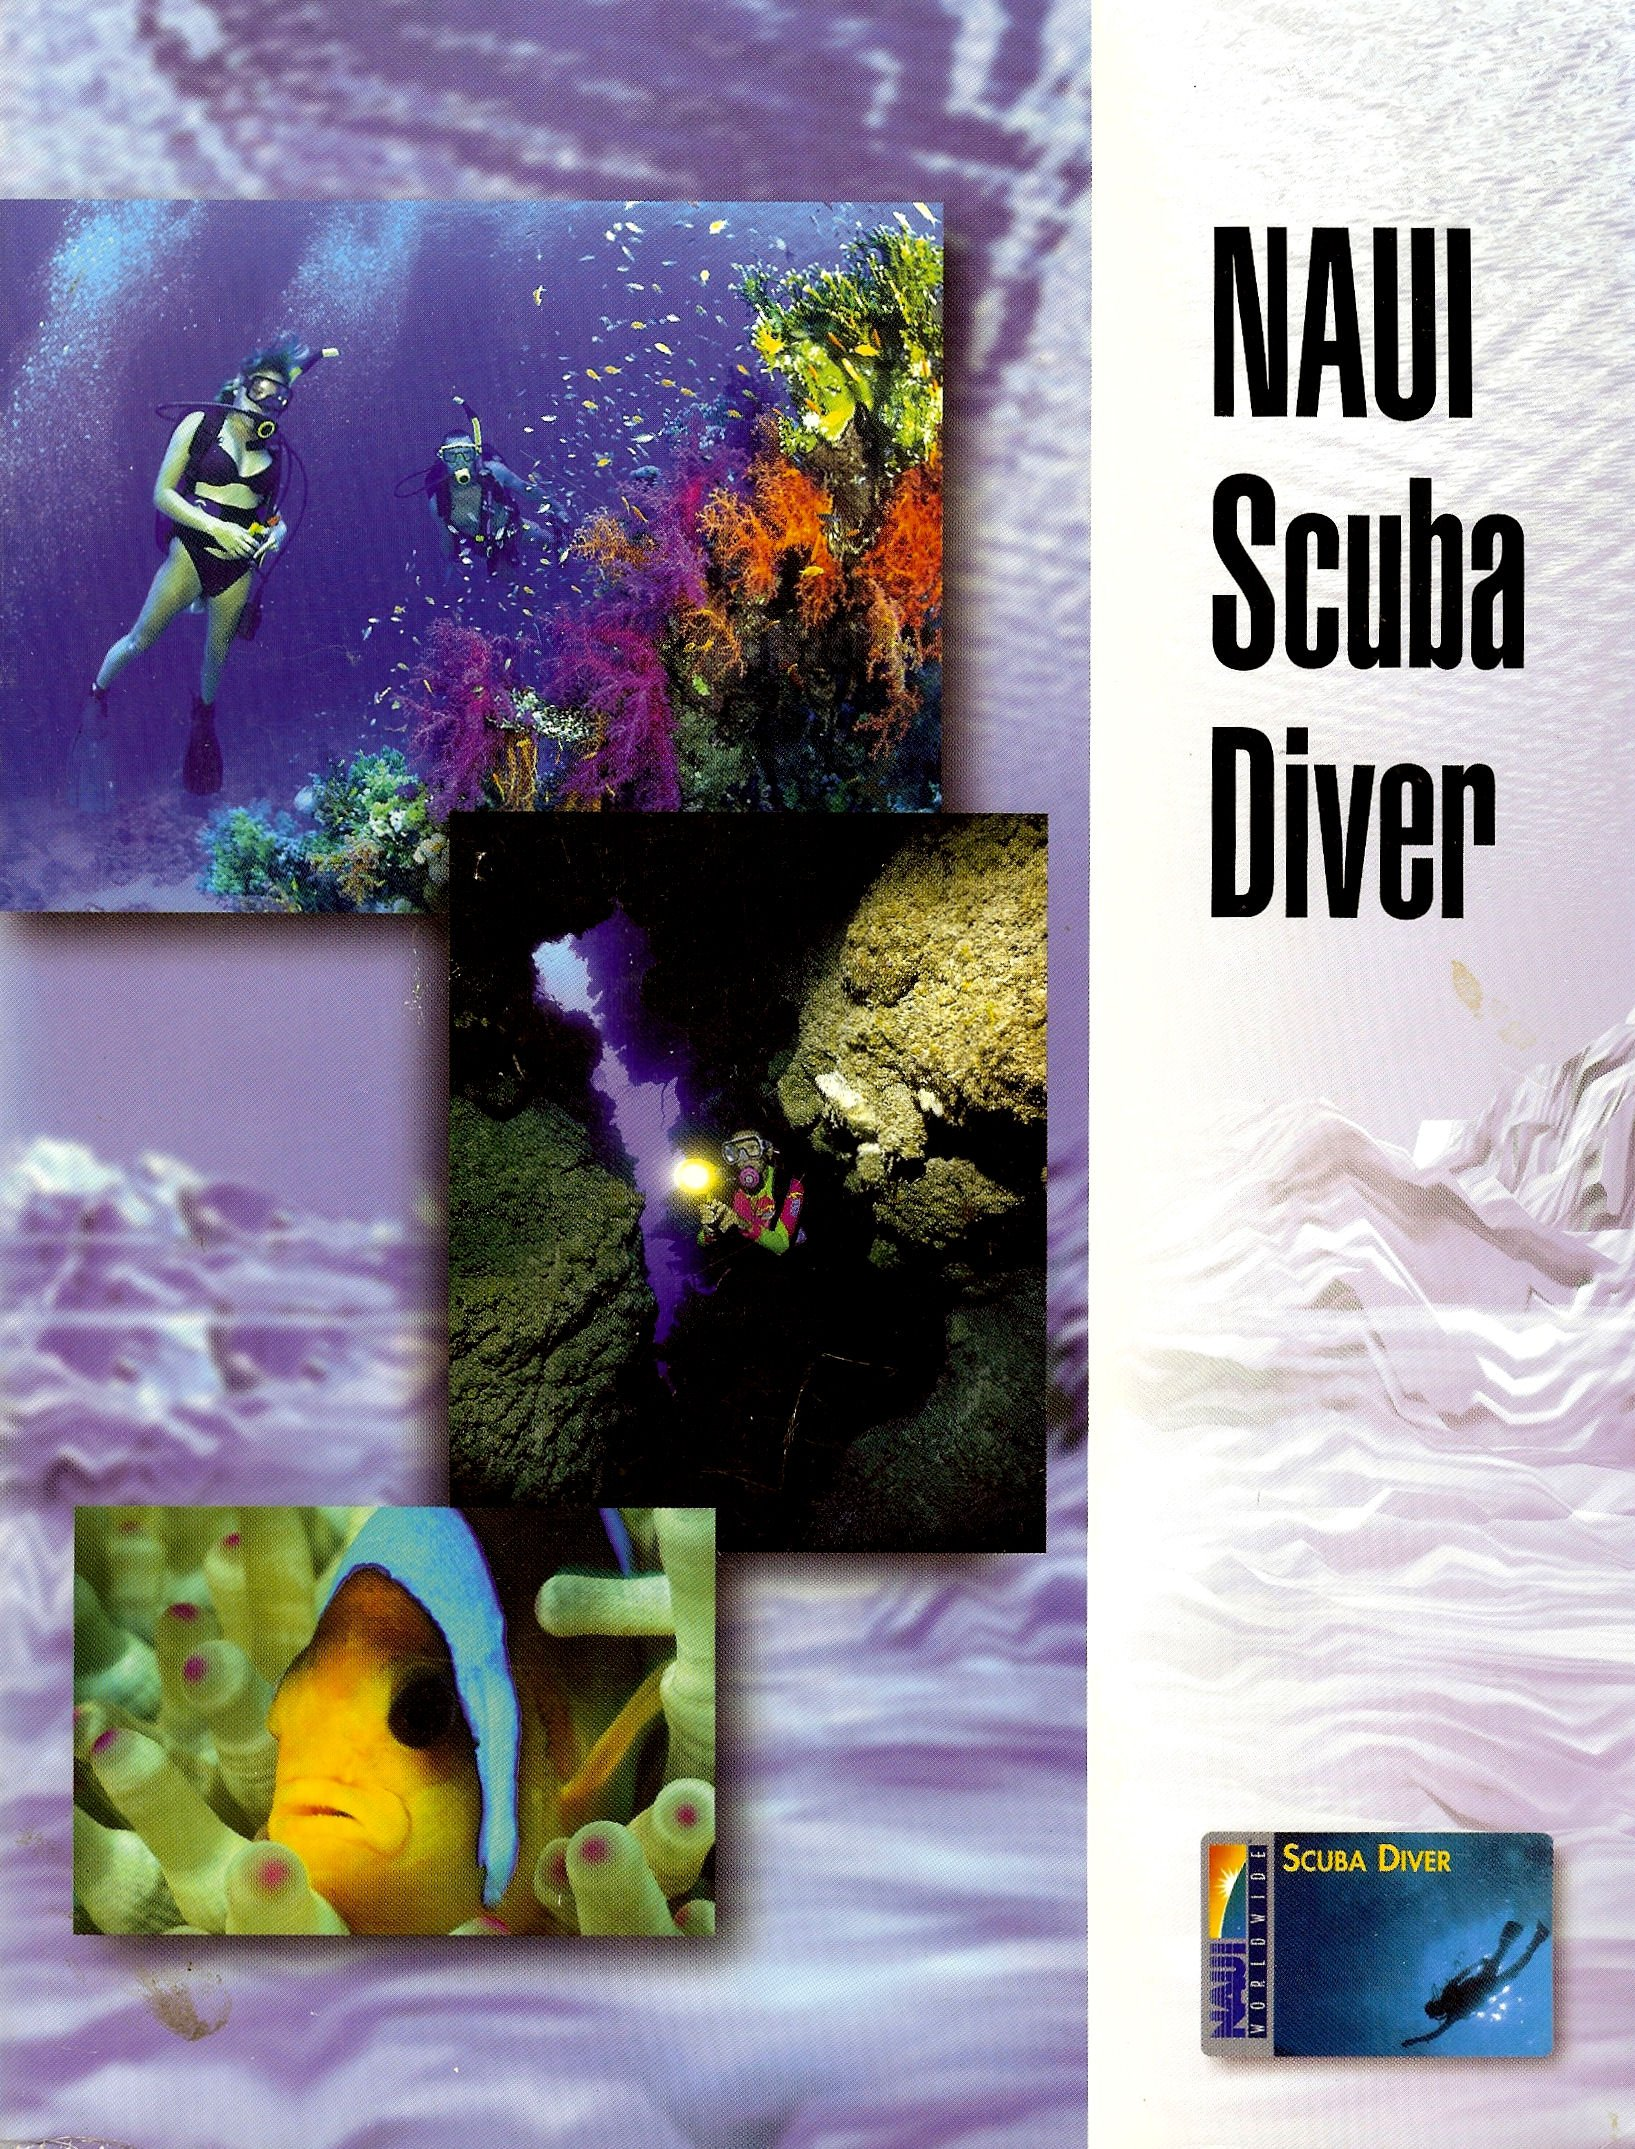 Naui Scuba Diver Anonymous 9780967990309 Amazon Books